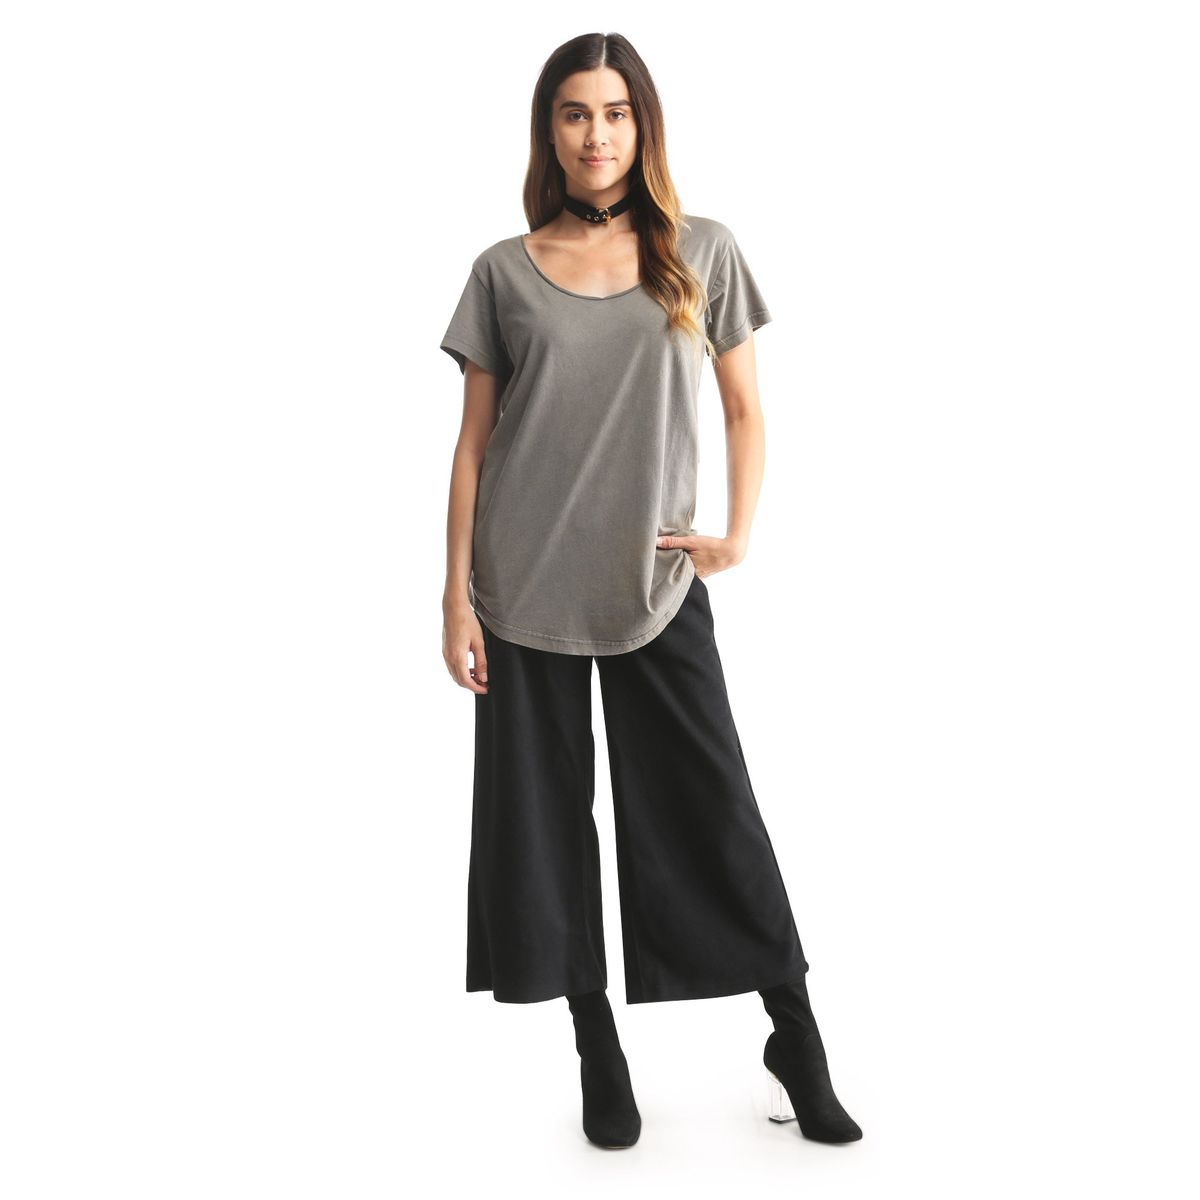 A grey T-shirt